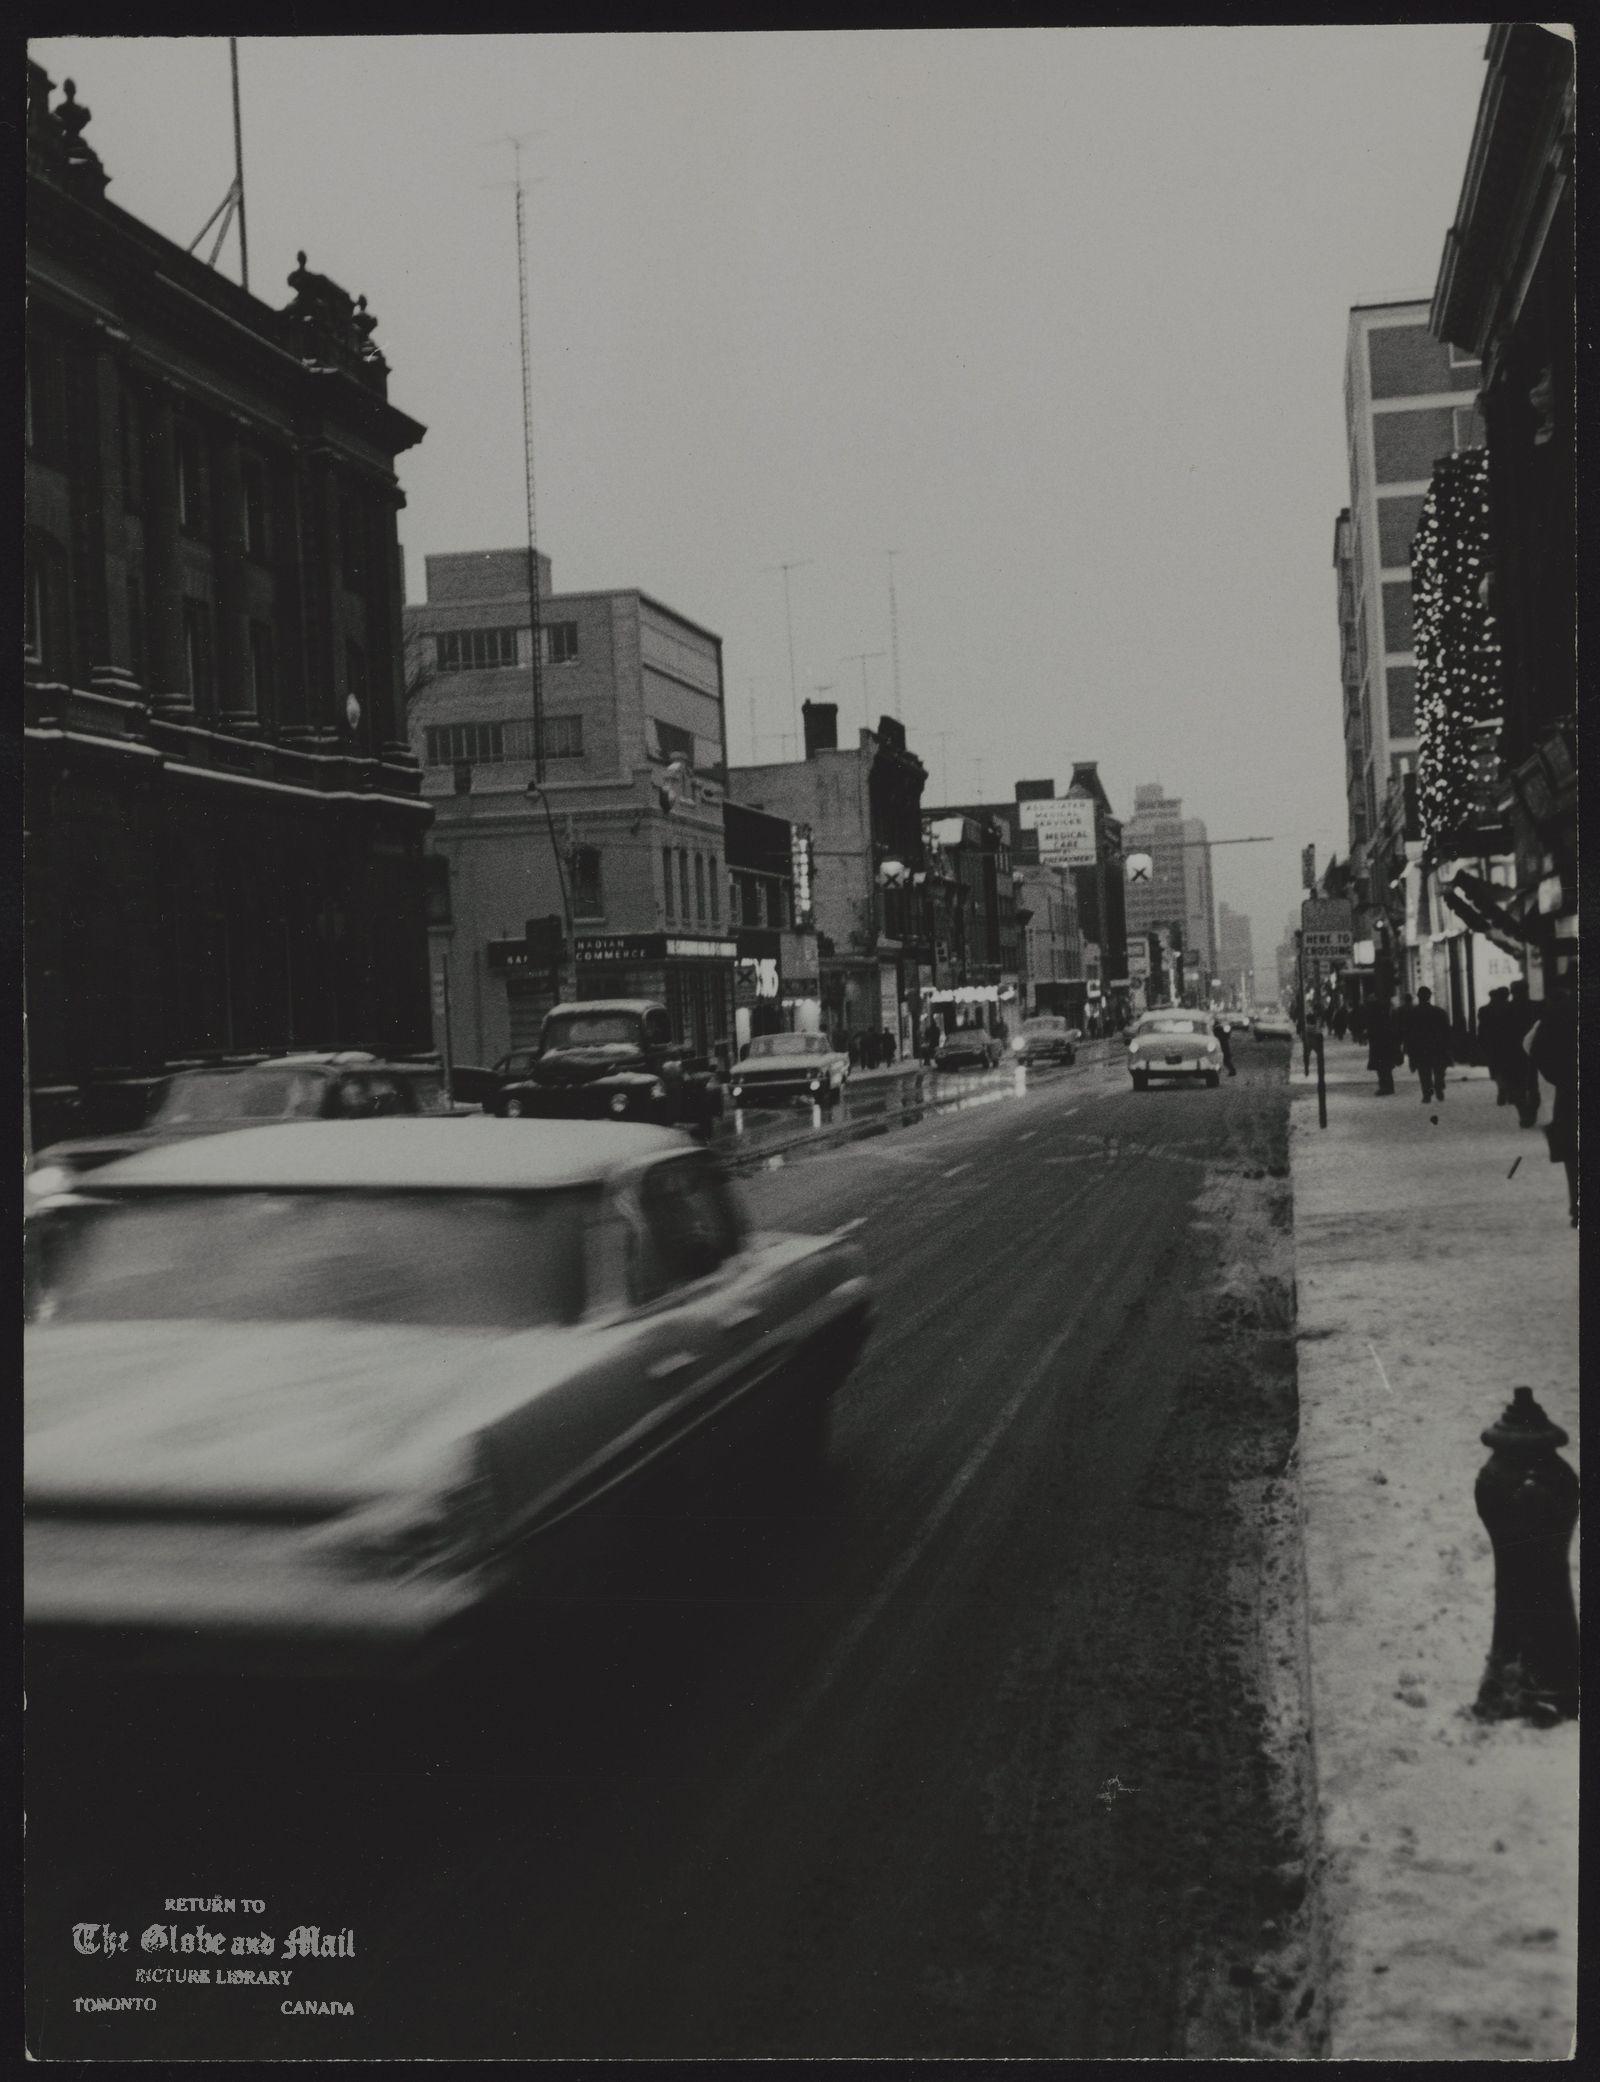 YONGE STREET (Toronto) No cutlline